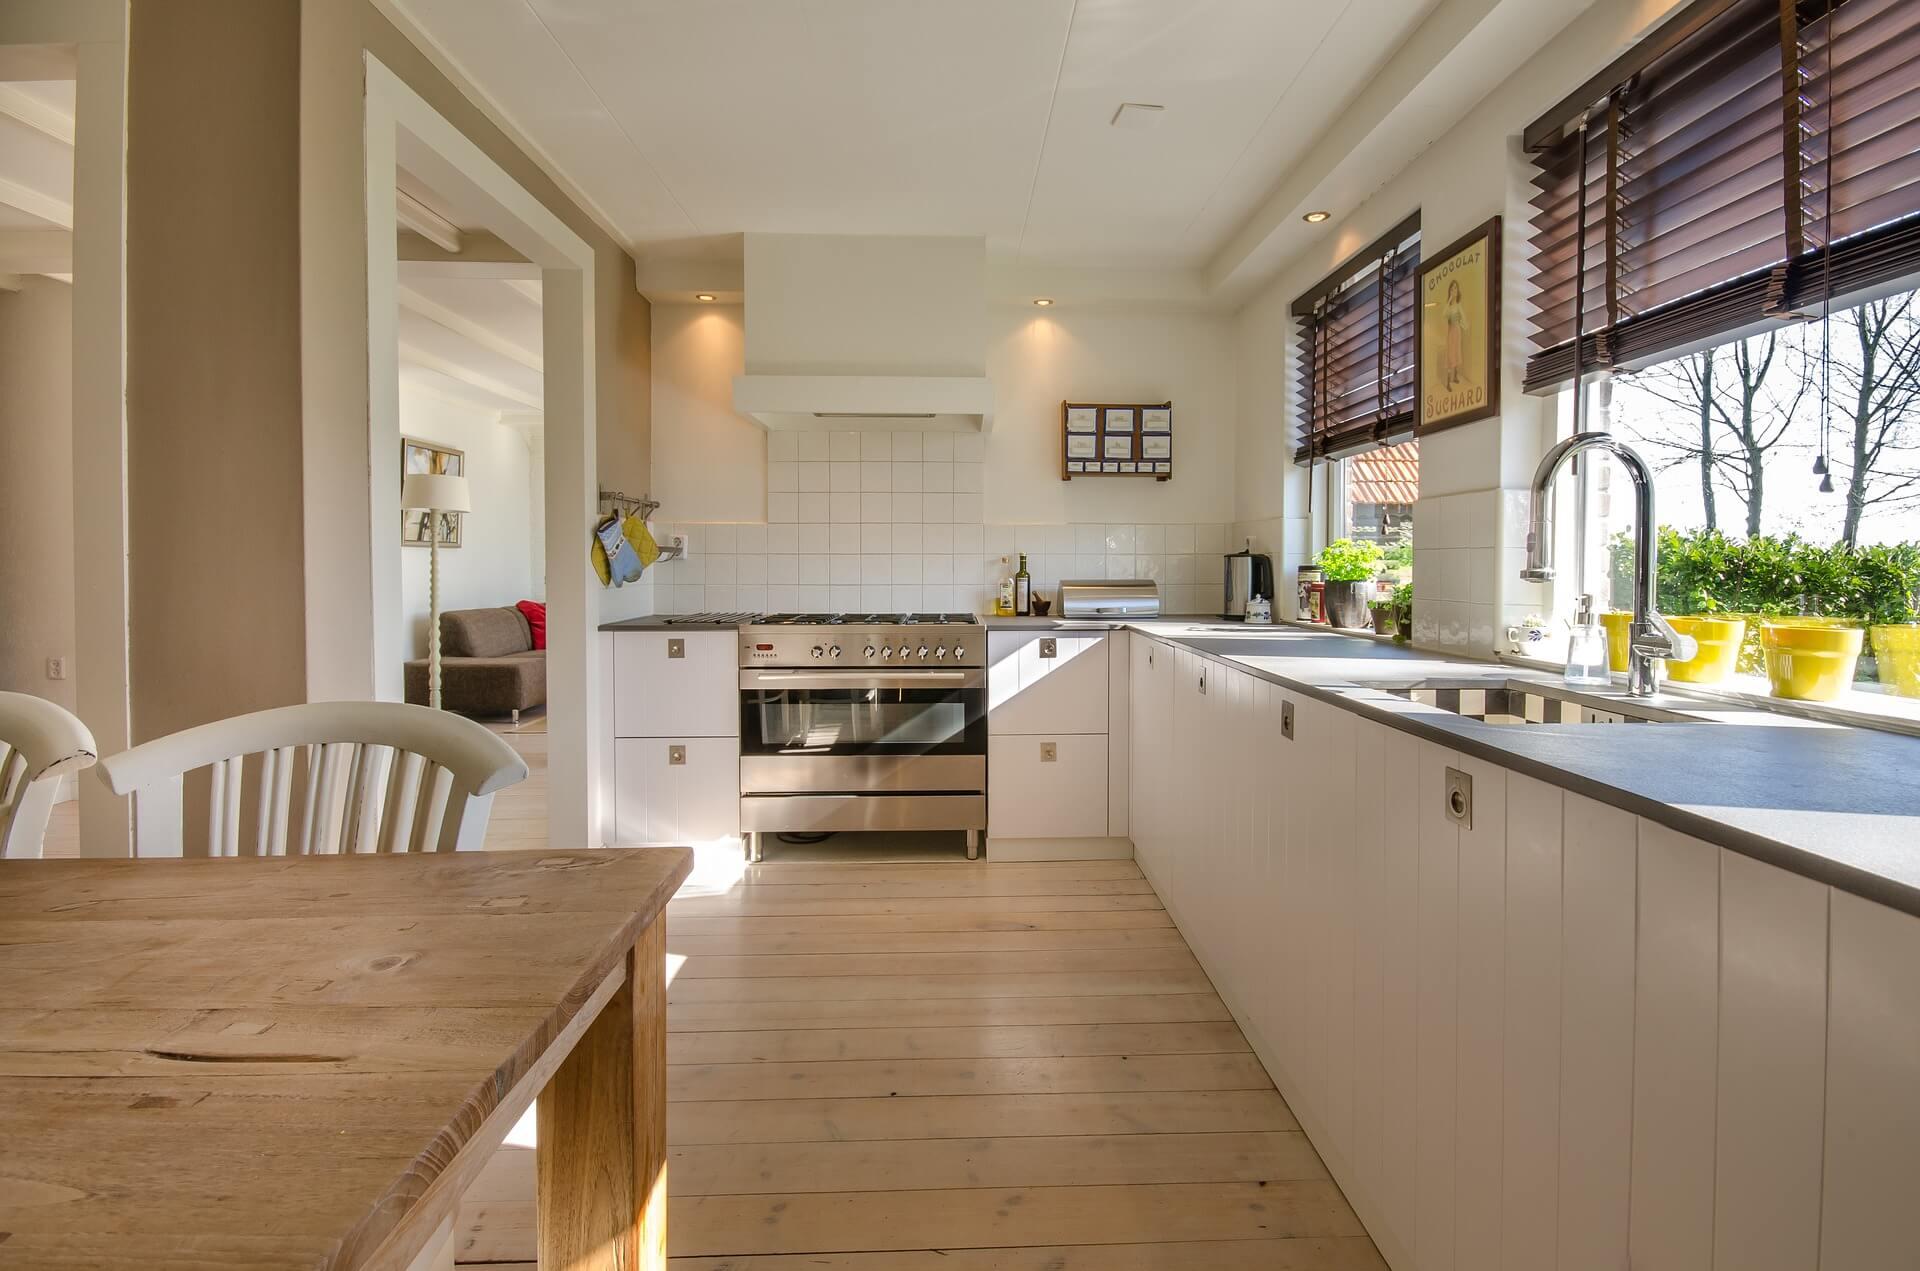 kitchen flooring - SoFlo Kitchen Remodeling & Custom Cabinet Installation - backsplashes, flooring, countertops